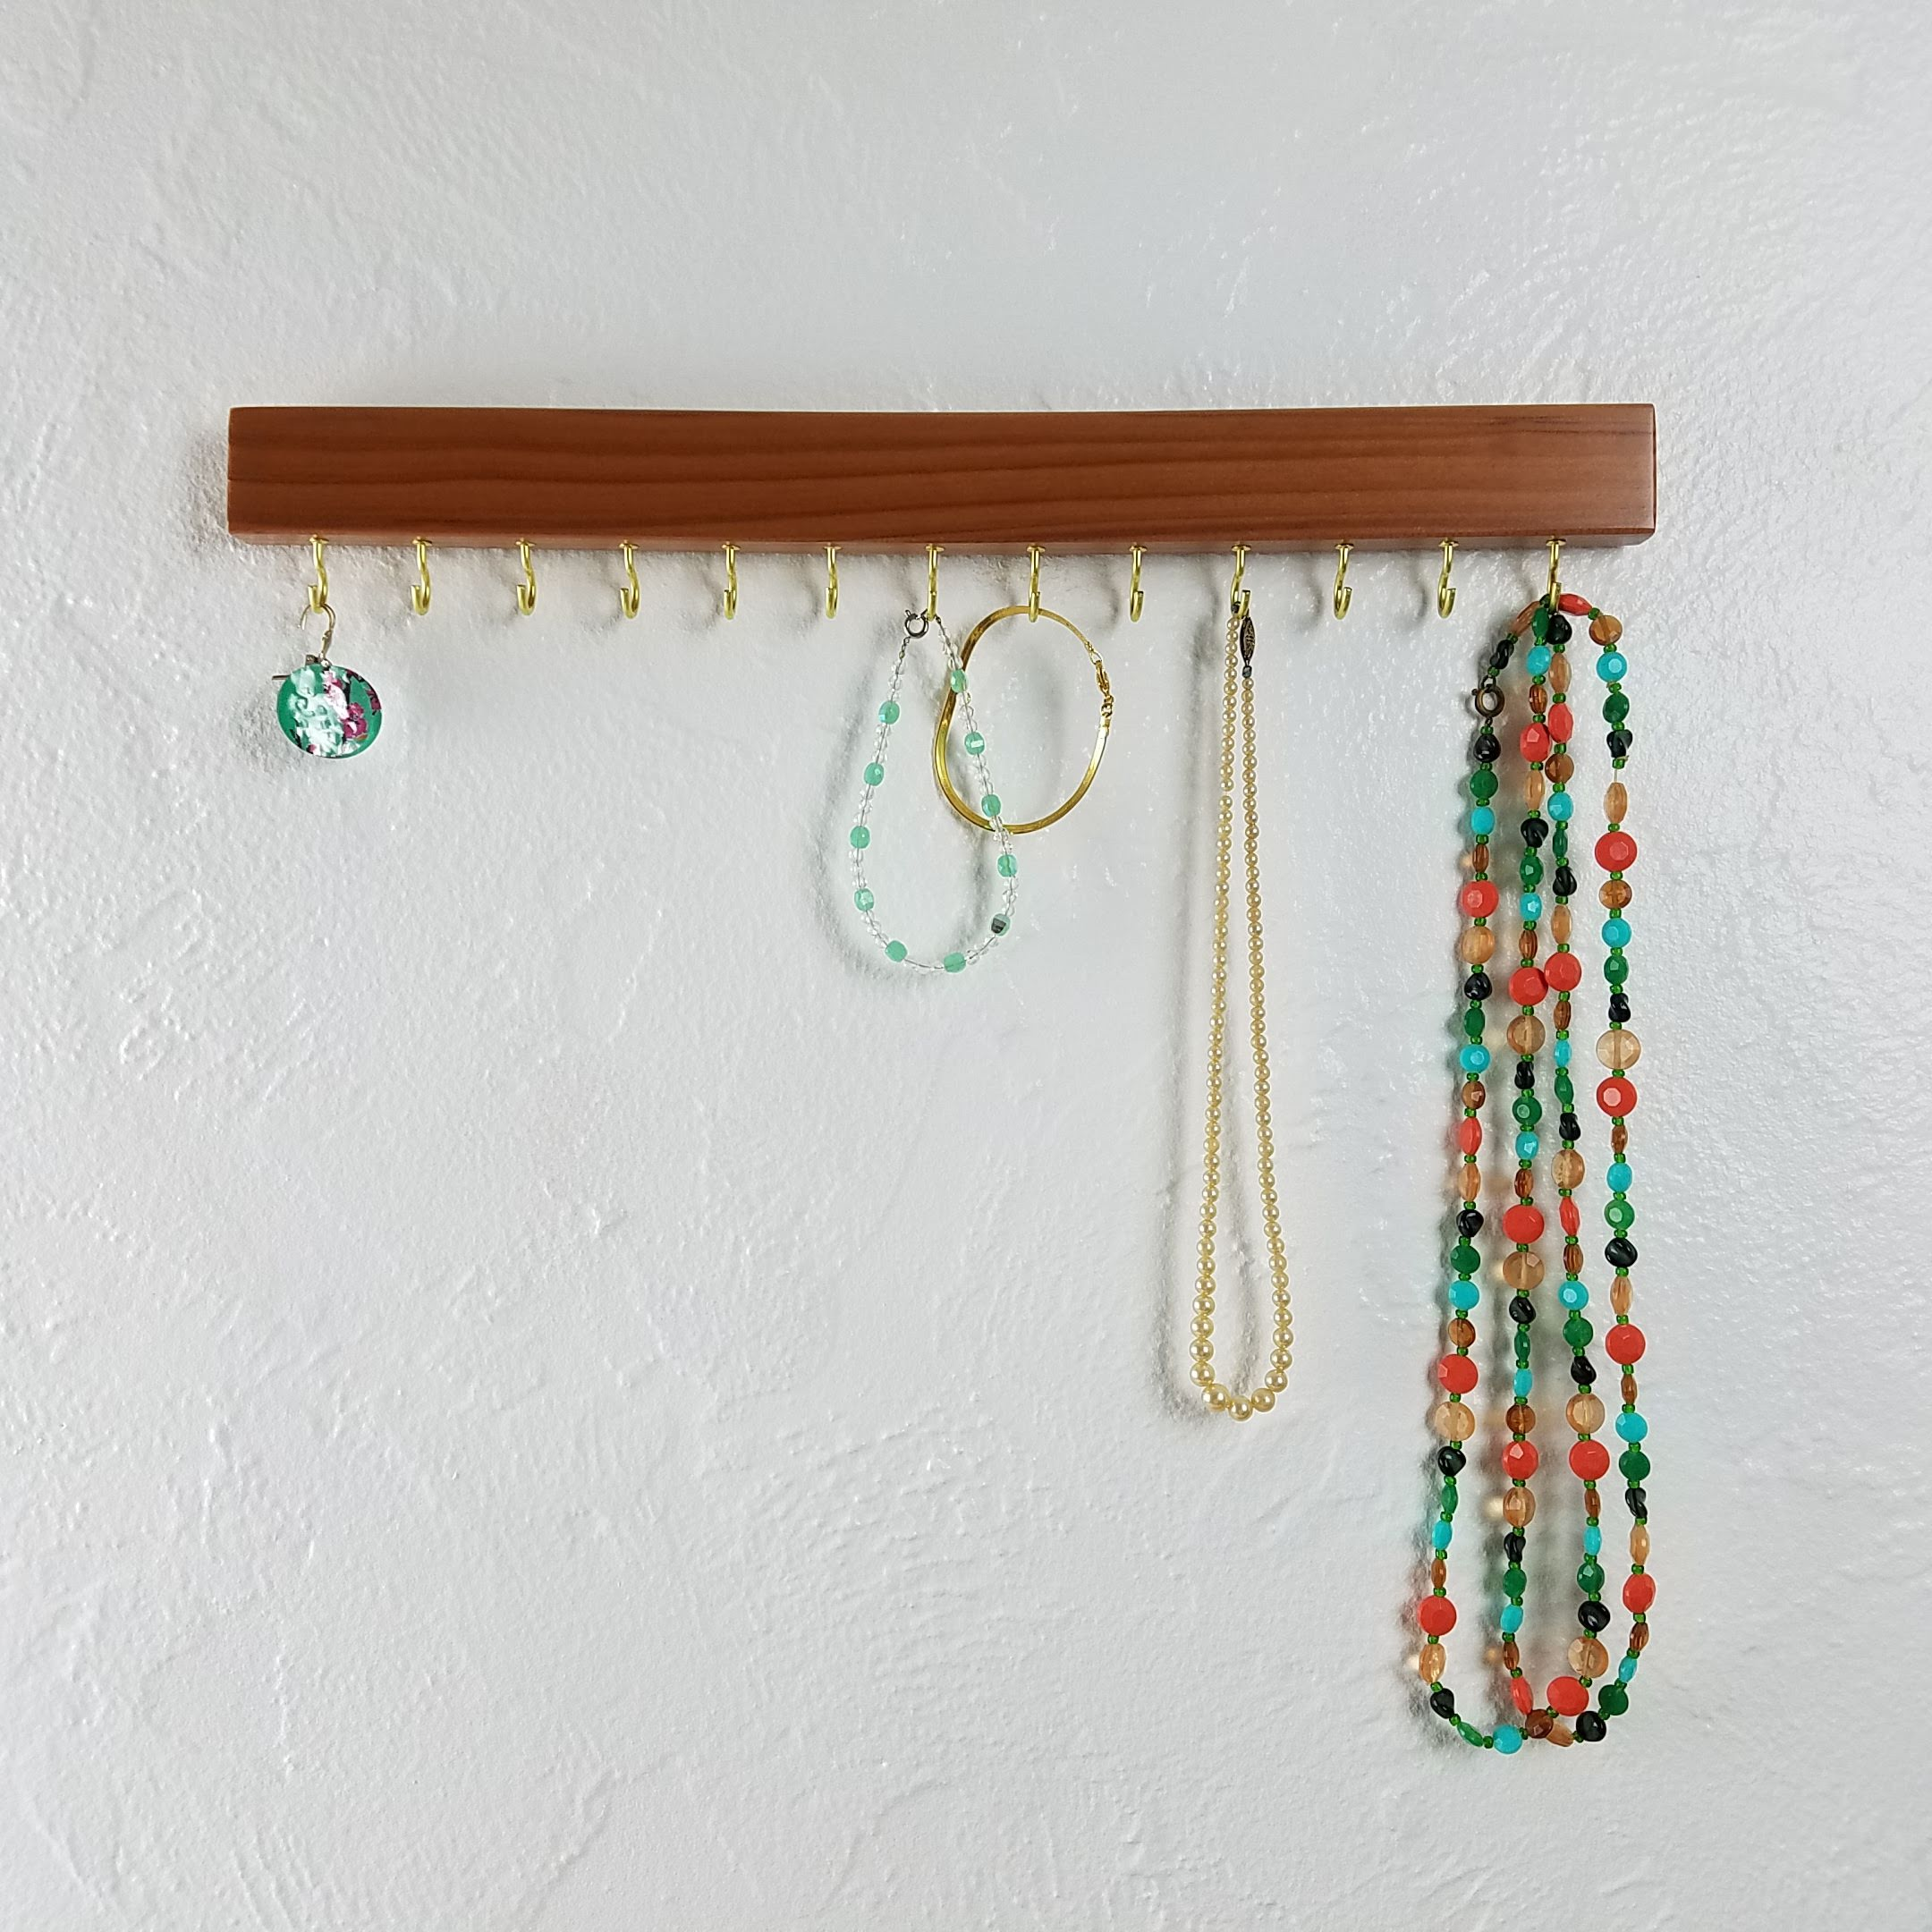 Small Redwood Natural Jewelry Organizer (6).jpg